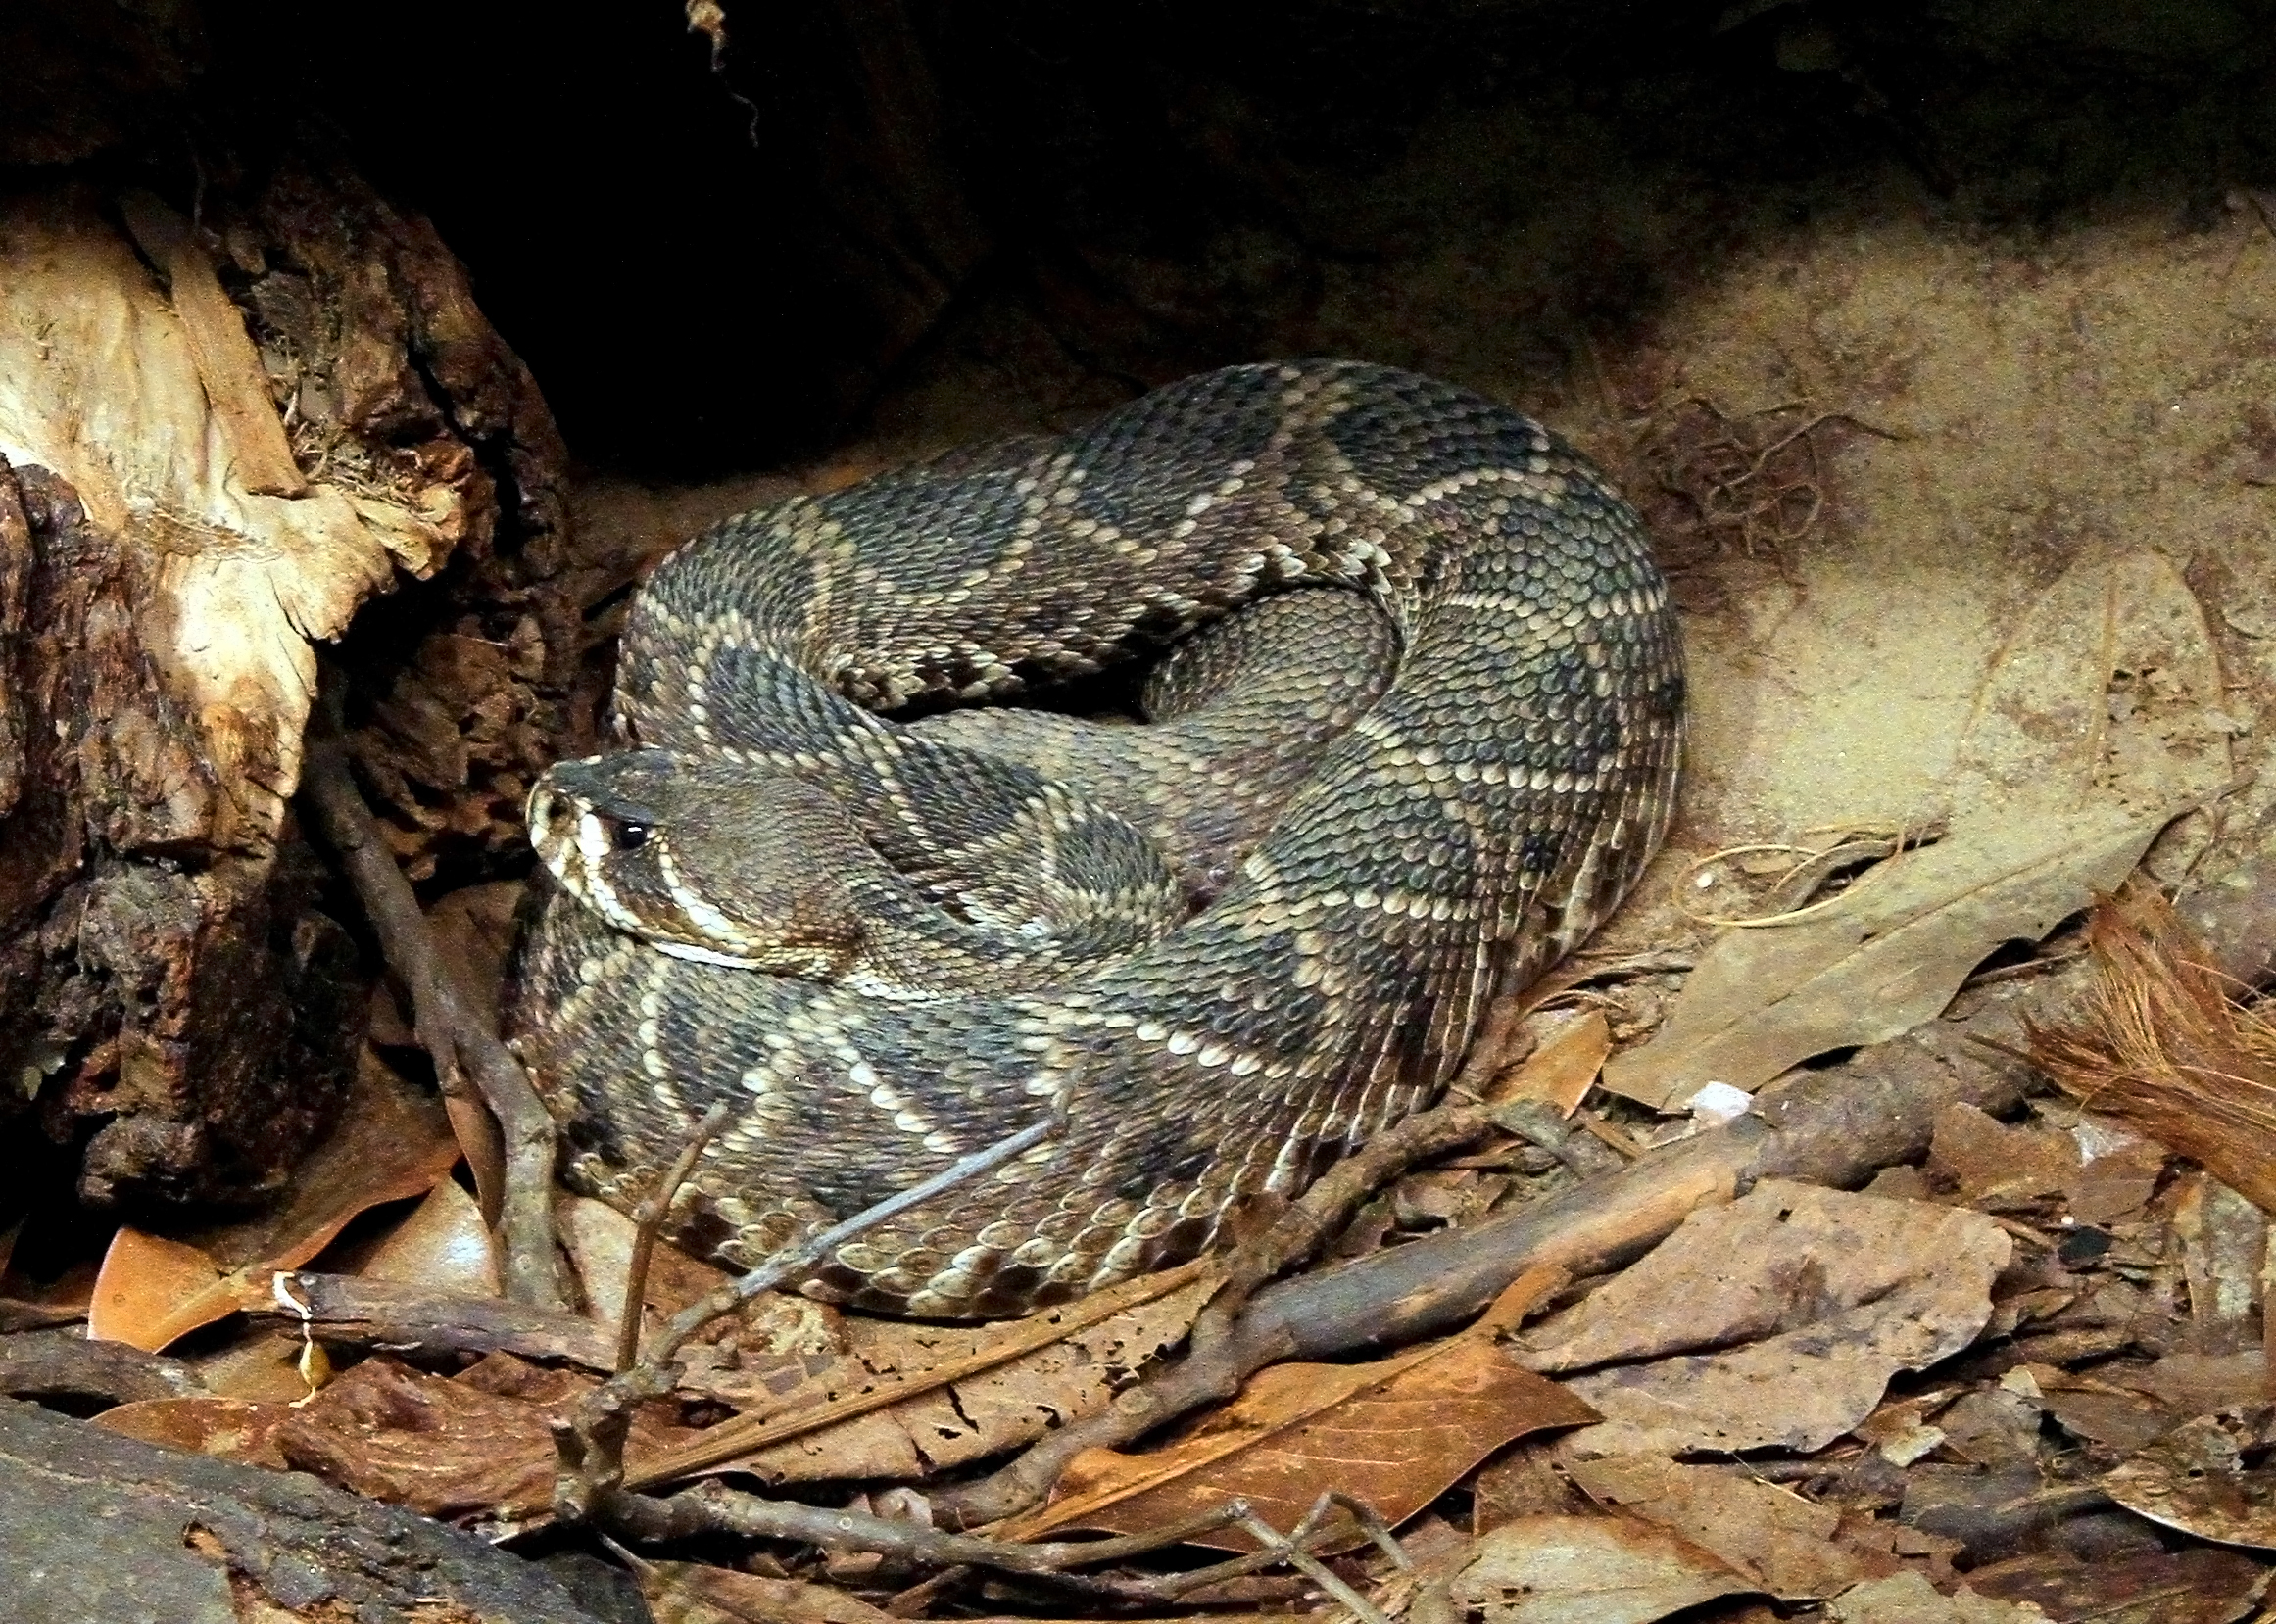 Eastern diamondback rattlesnake - Wikipedia